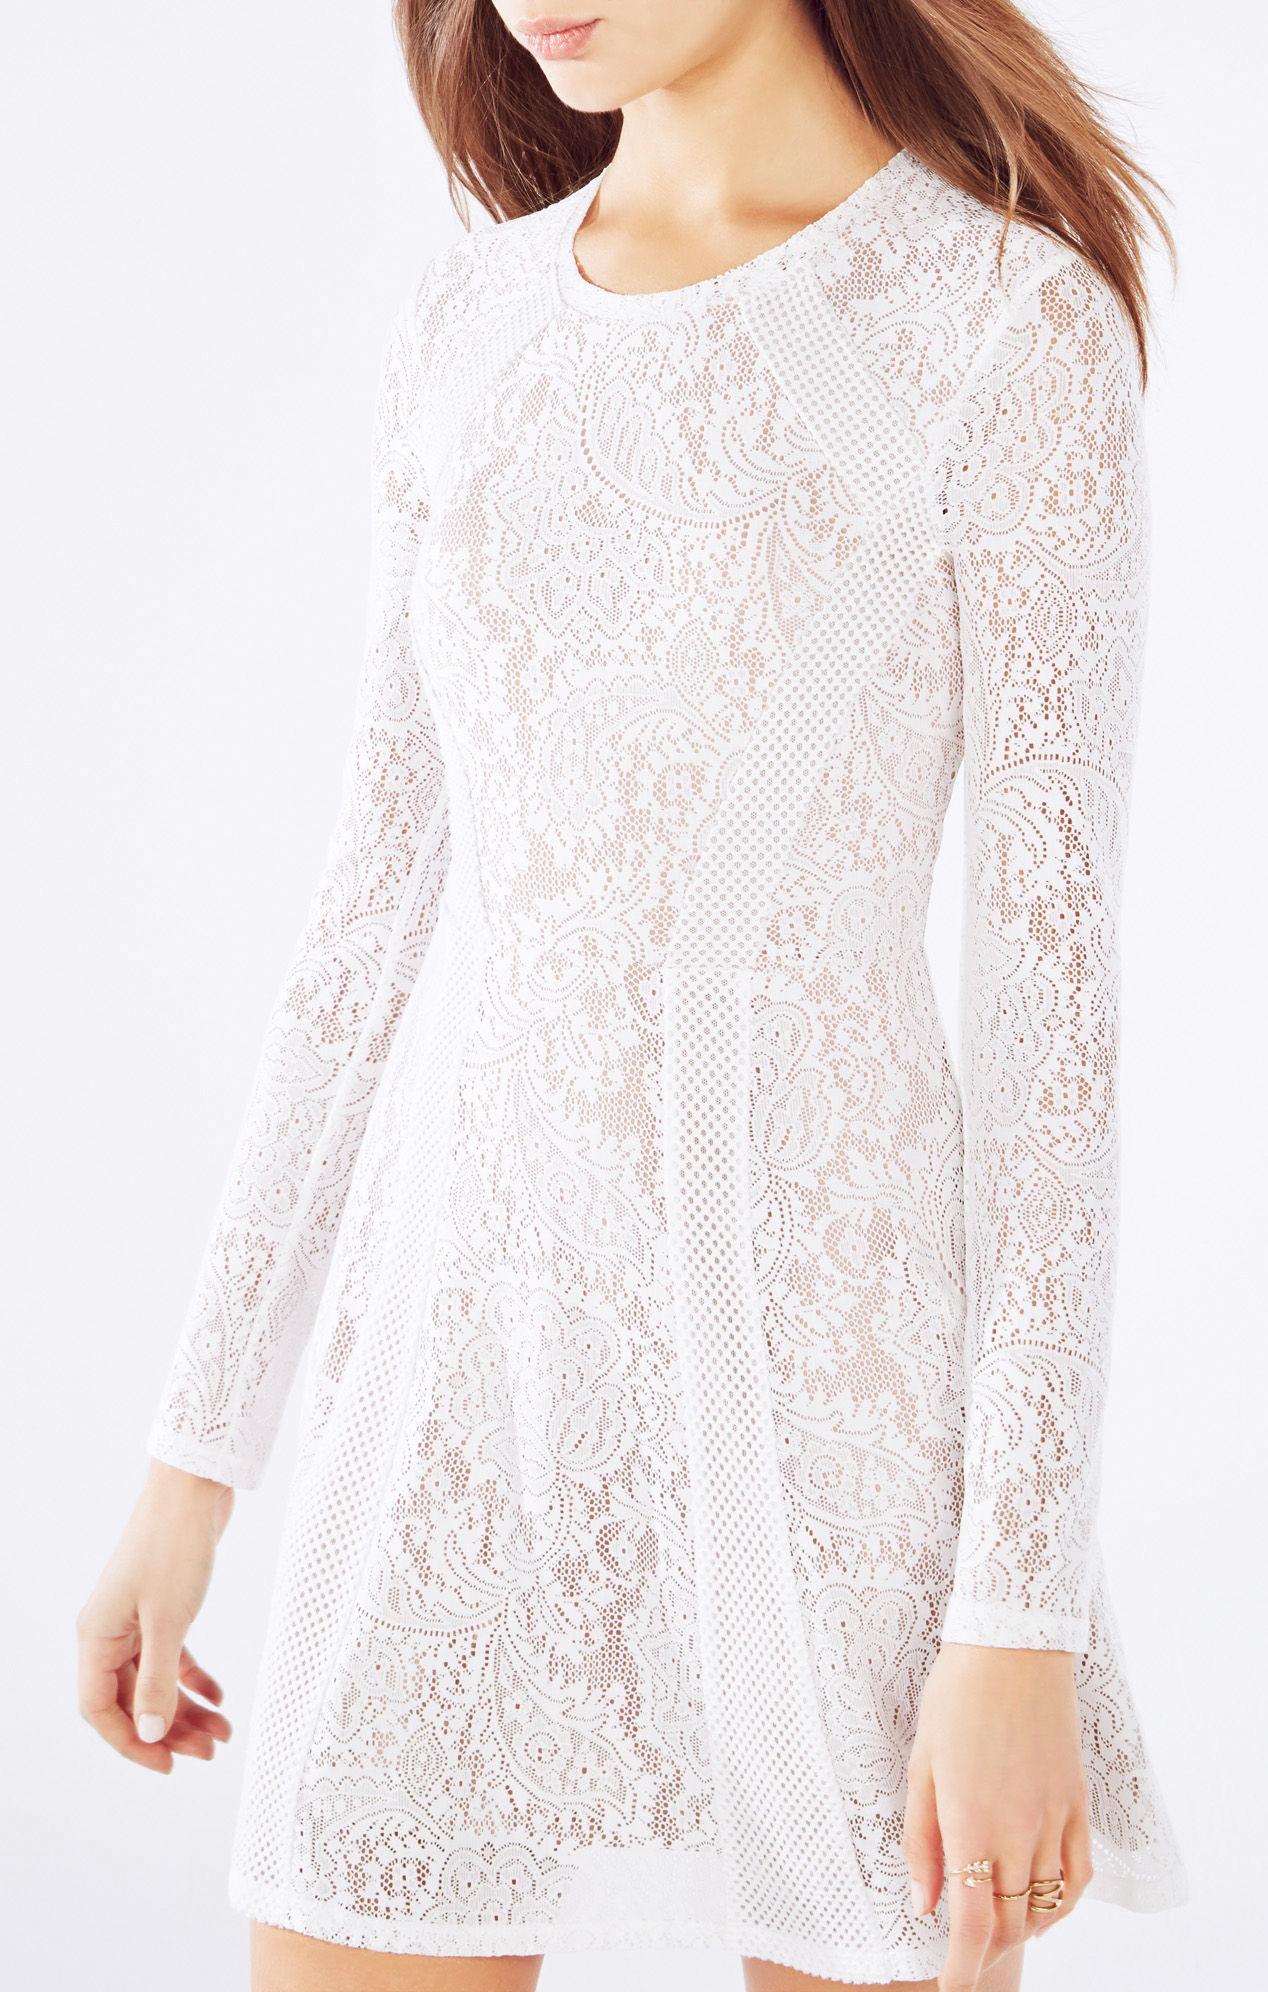 eff5983e95 Bcbg White Lace Dress Long Sleeve - Photo Dress Wallpaper HD AOrg